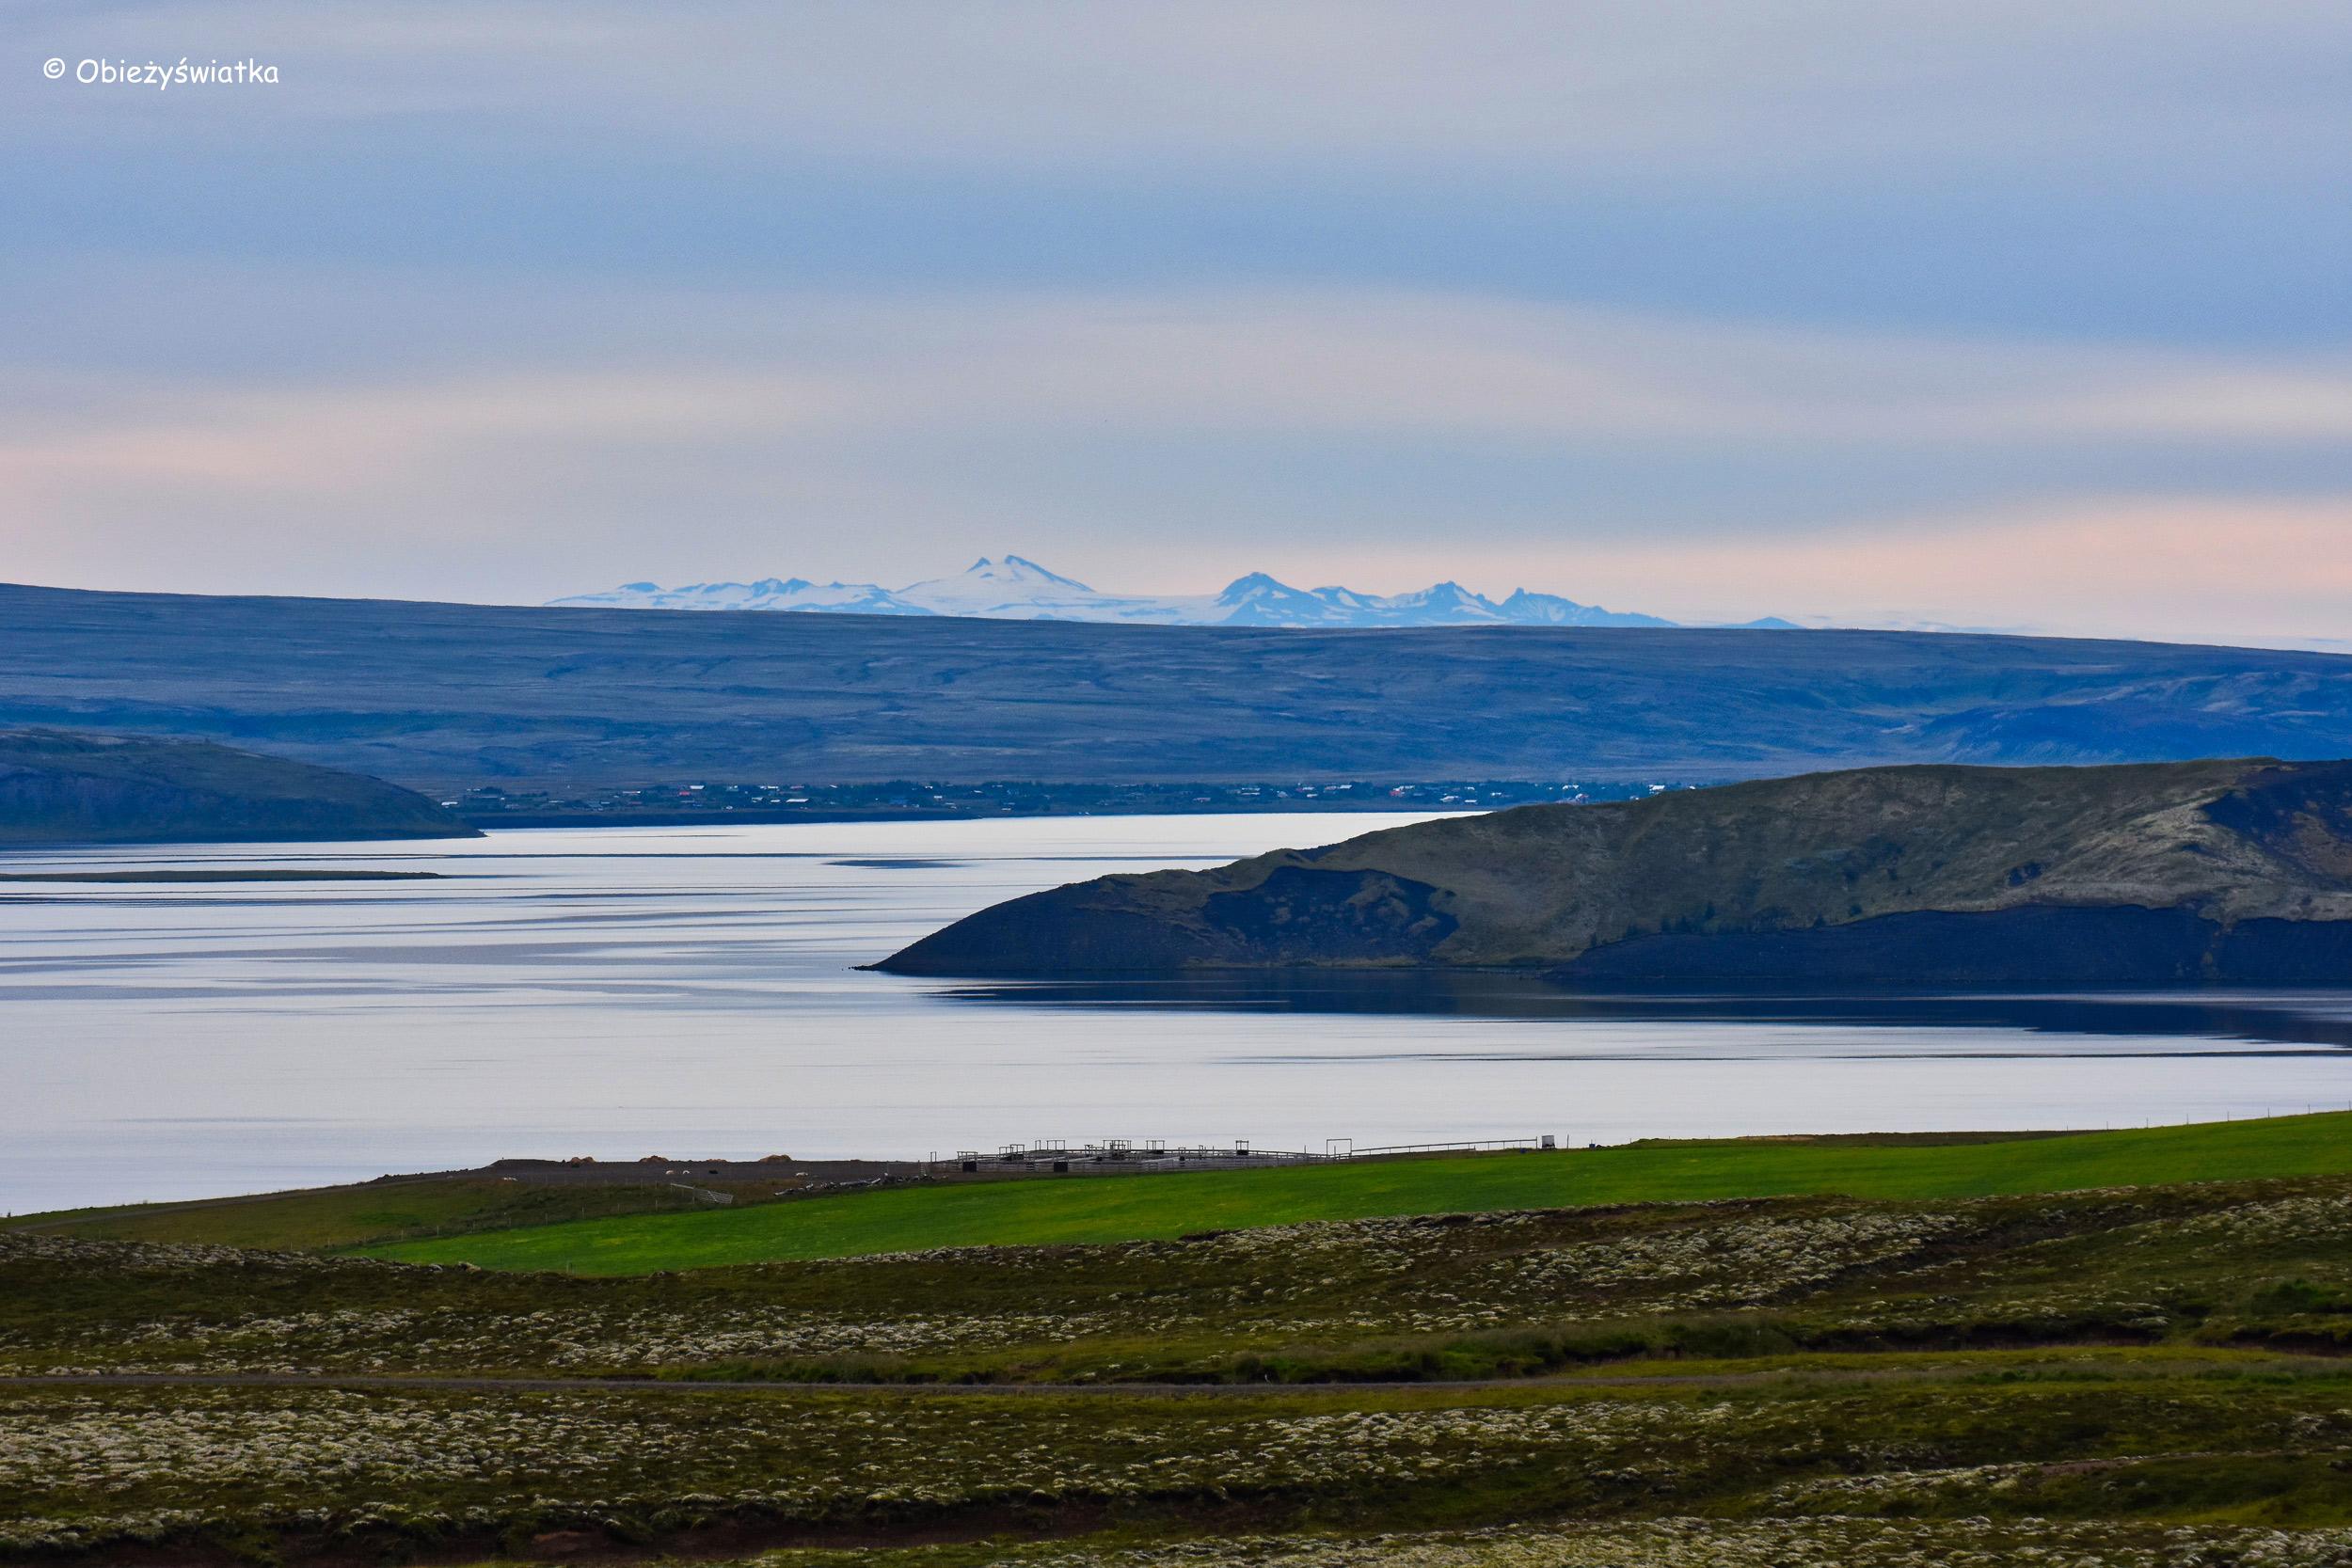 Widok na jezioro Þingvallavatn, Islandia